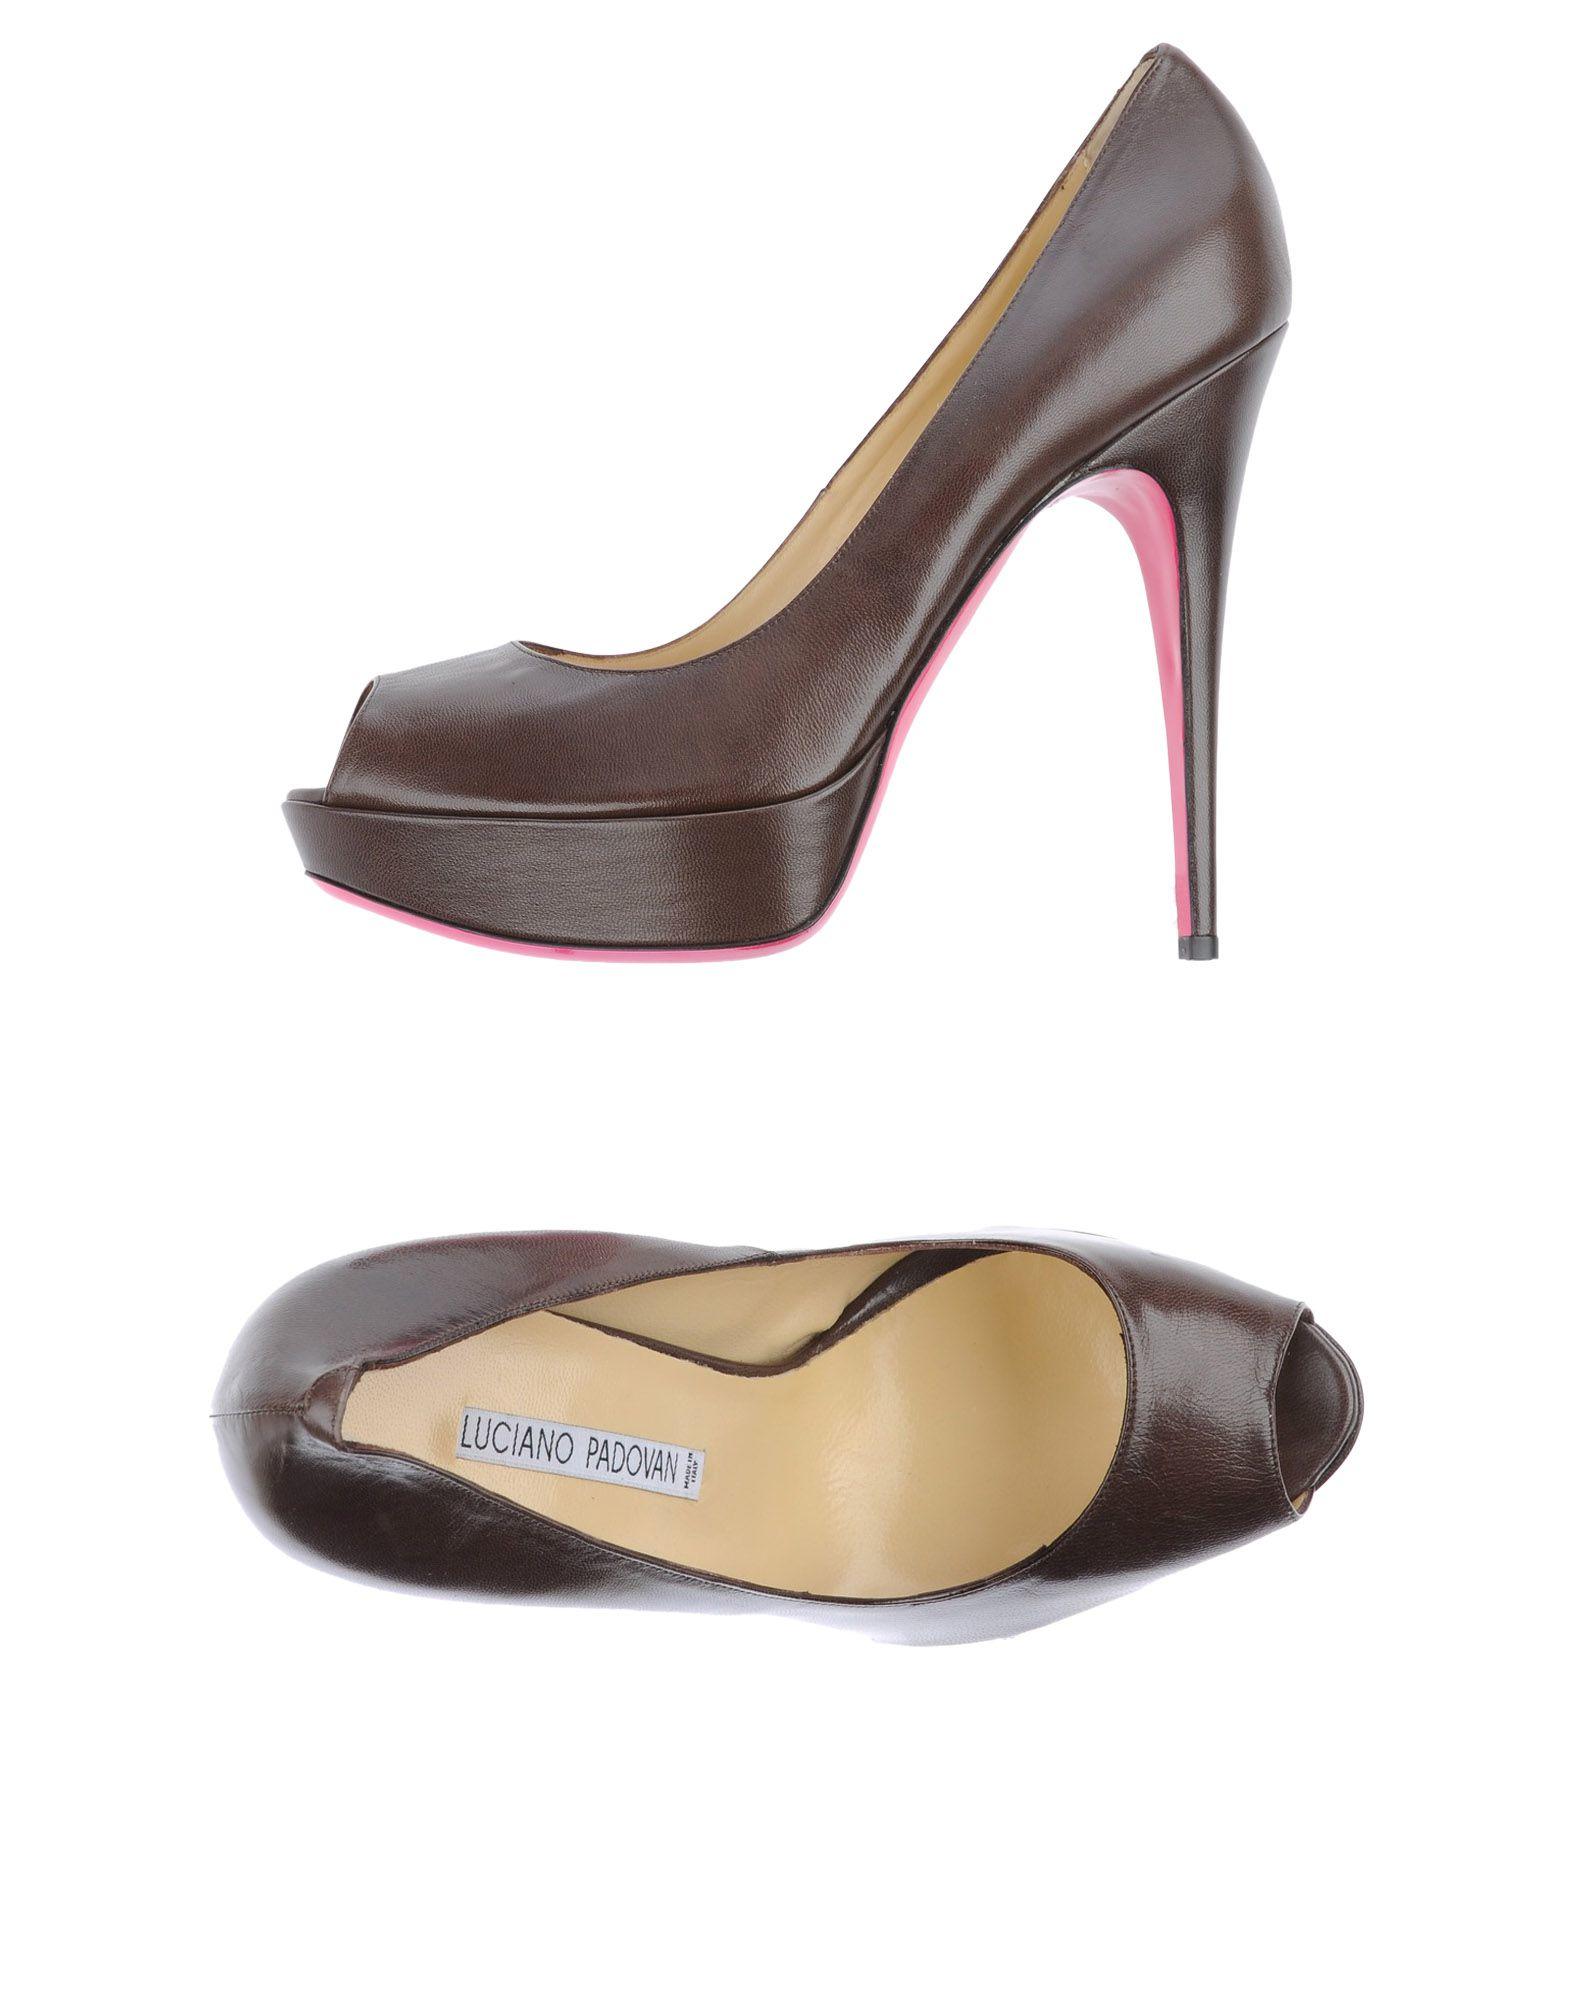 Luciano Padovan High Heel Shoes